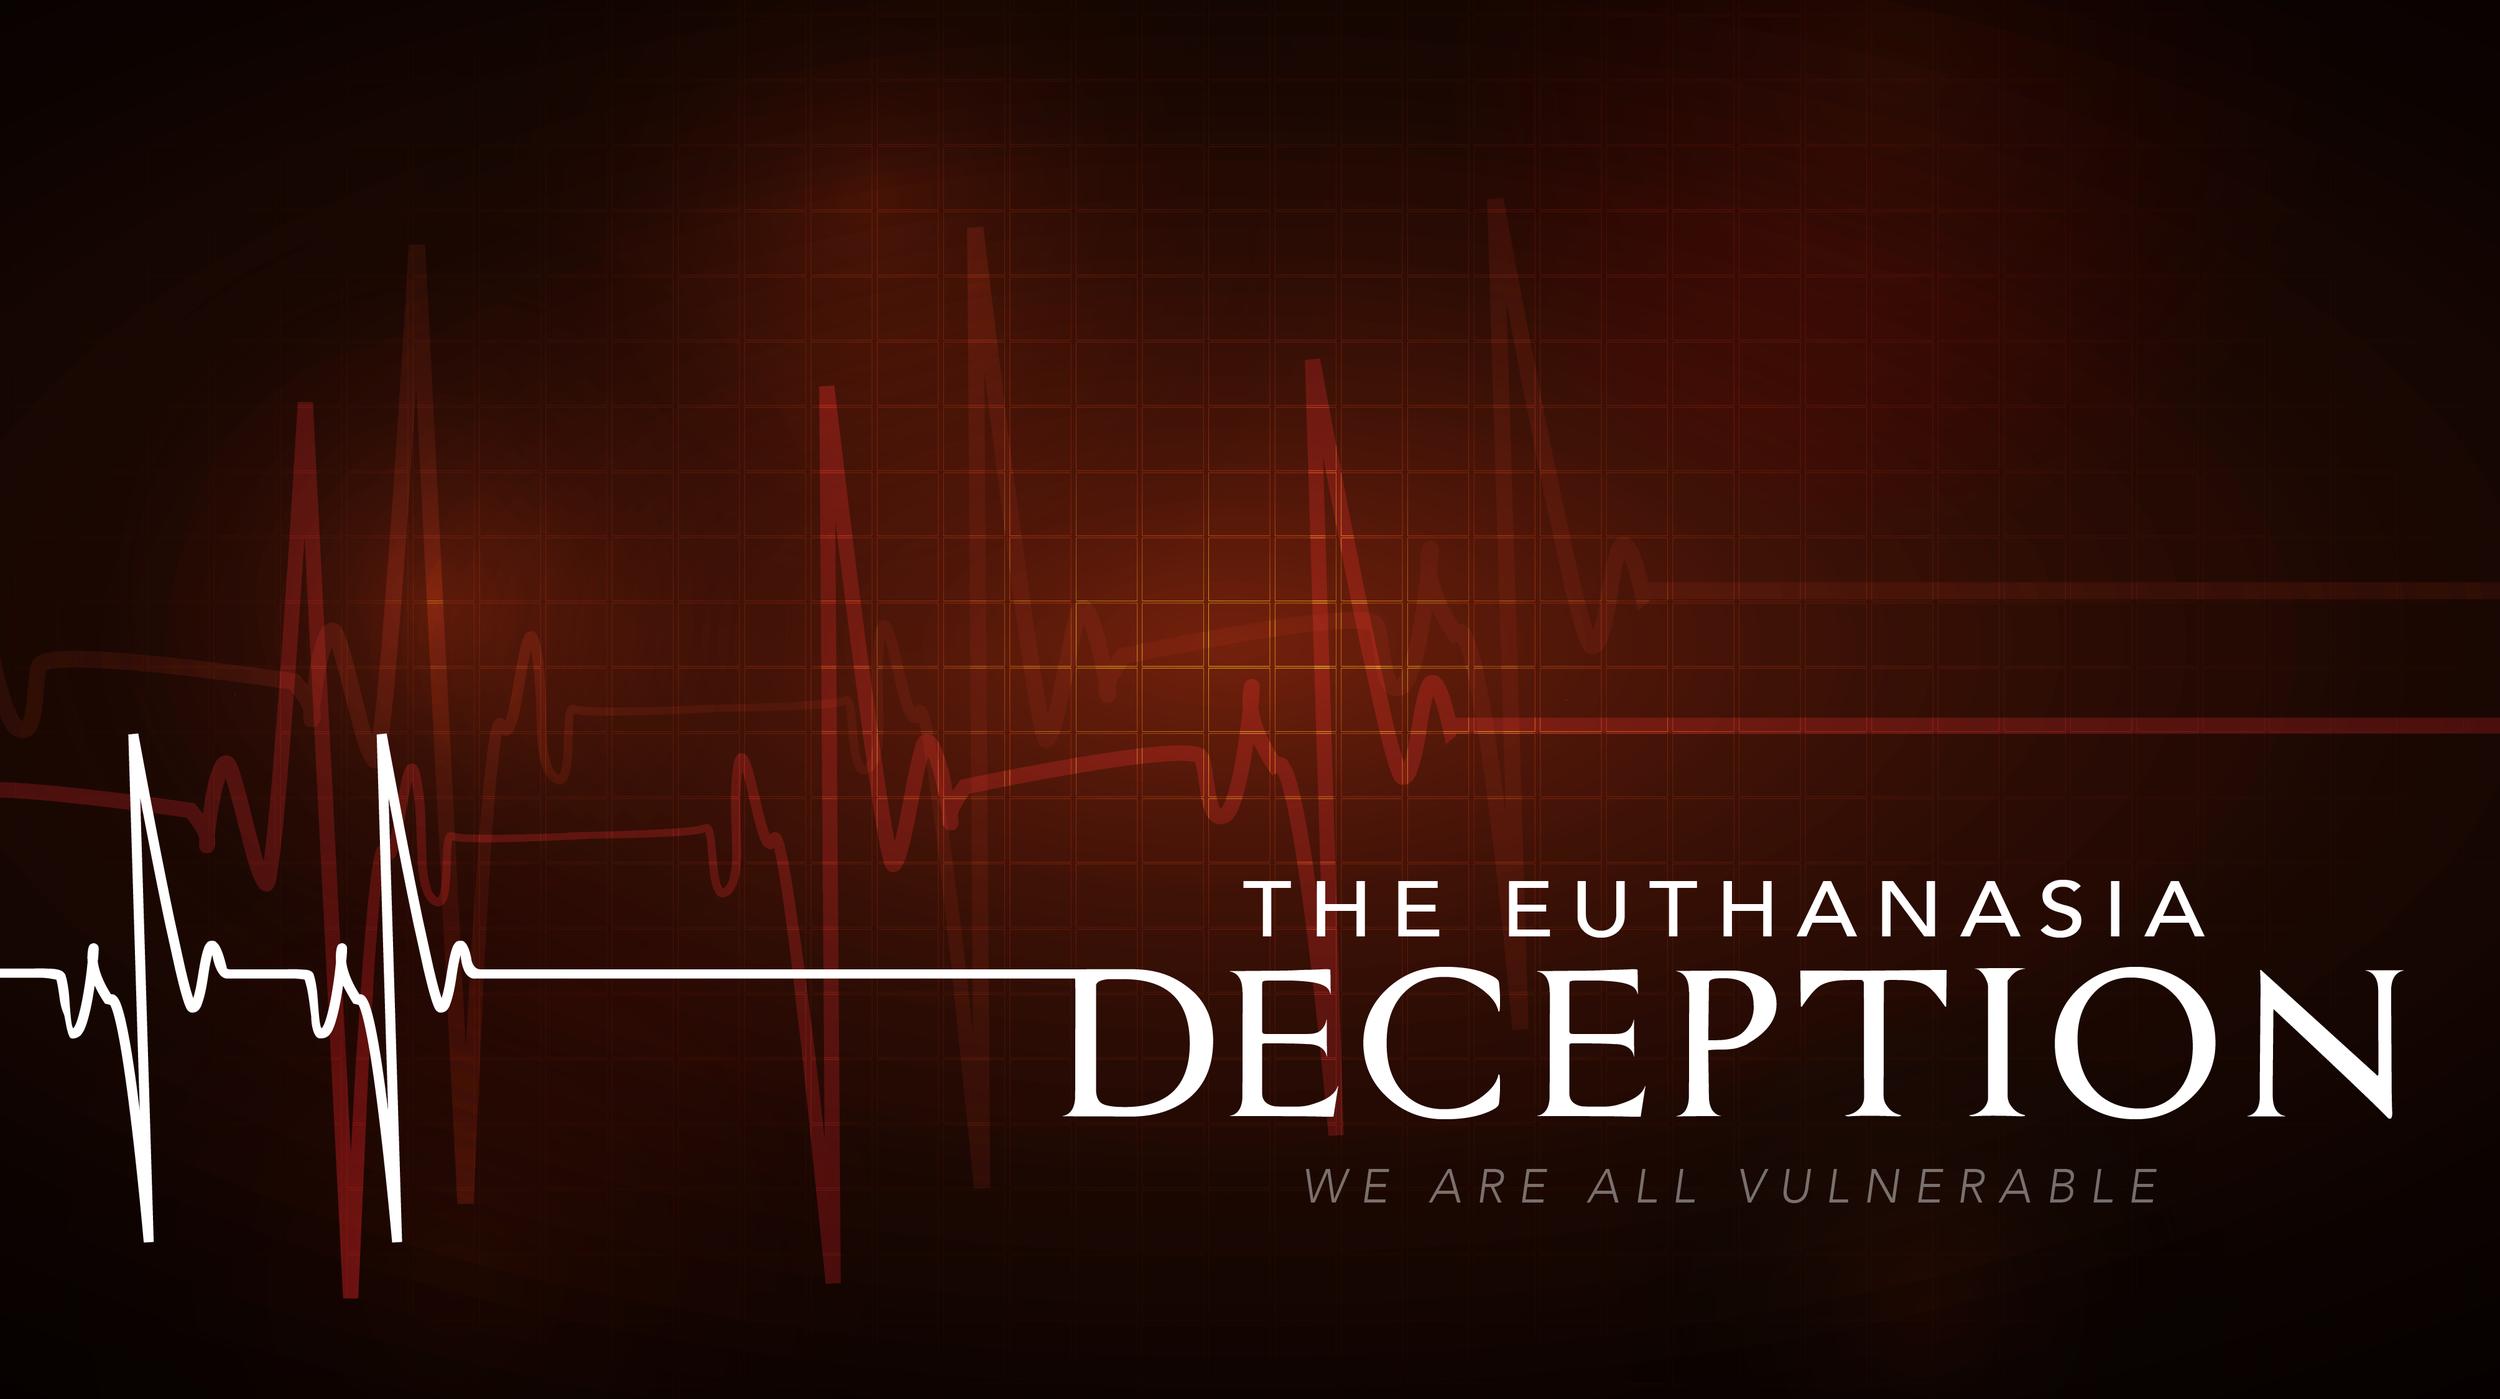 Euthanasia Deception 2016